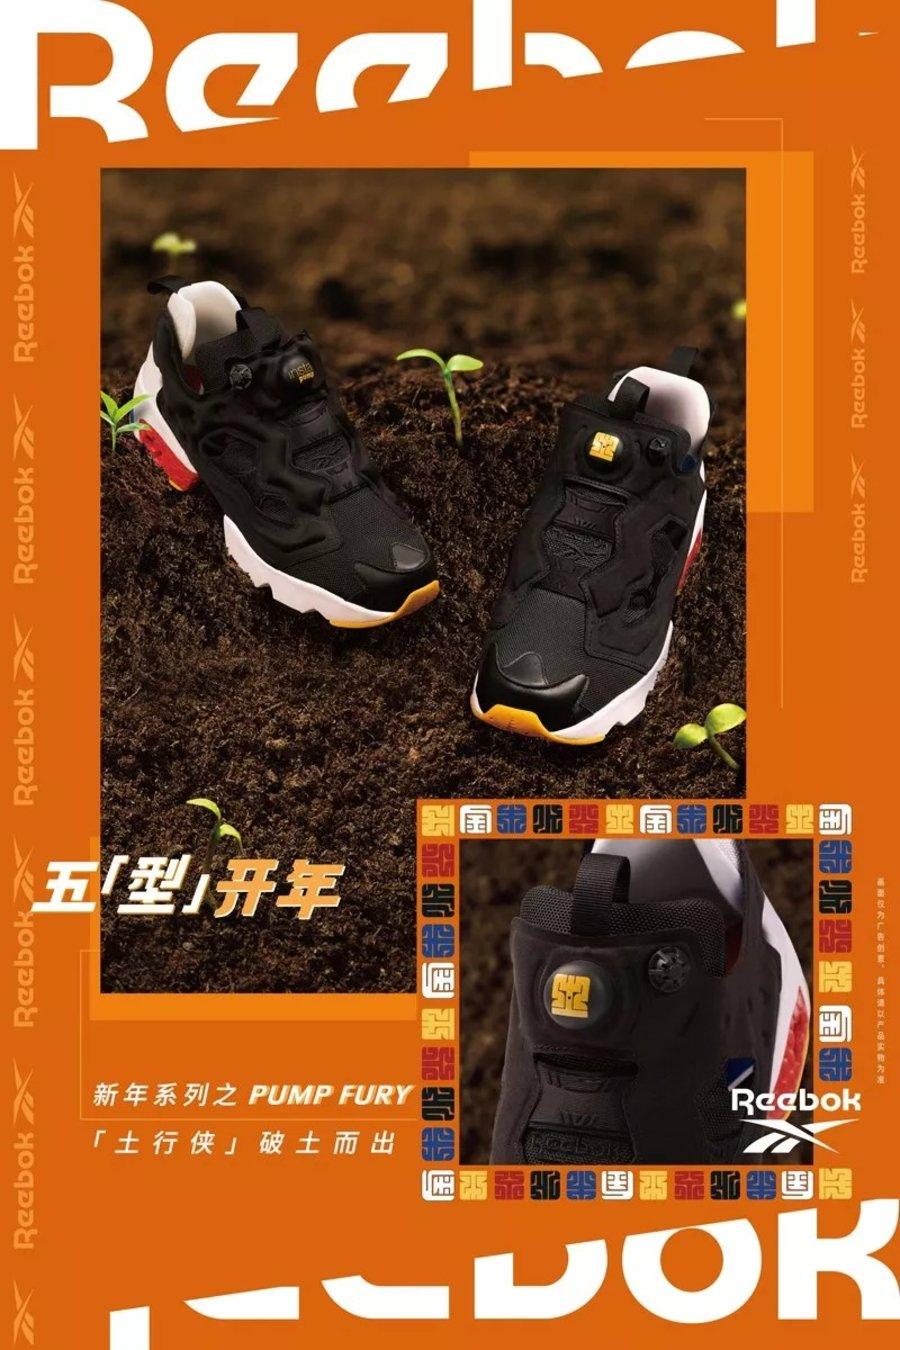 Reebok,CNY,Pump Fury,发售 陈伟霆抢先上脚!年味十足的 Reebok CNY 球鞋现已发售!